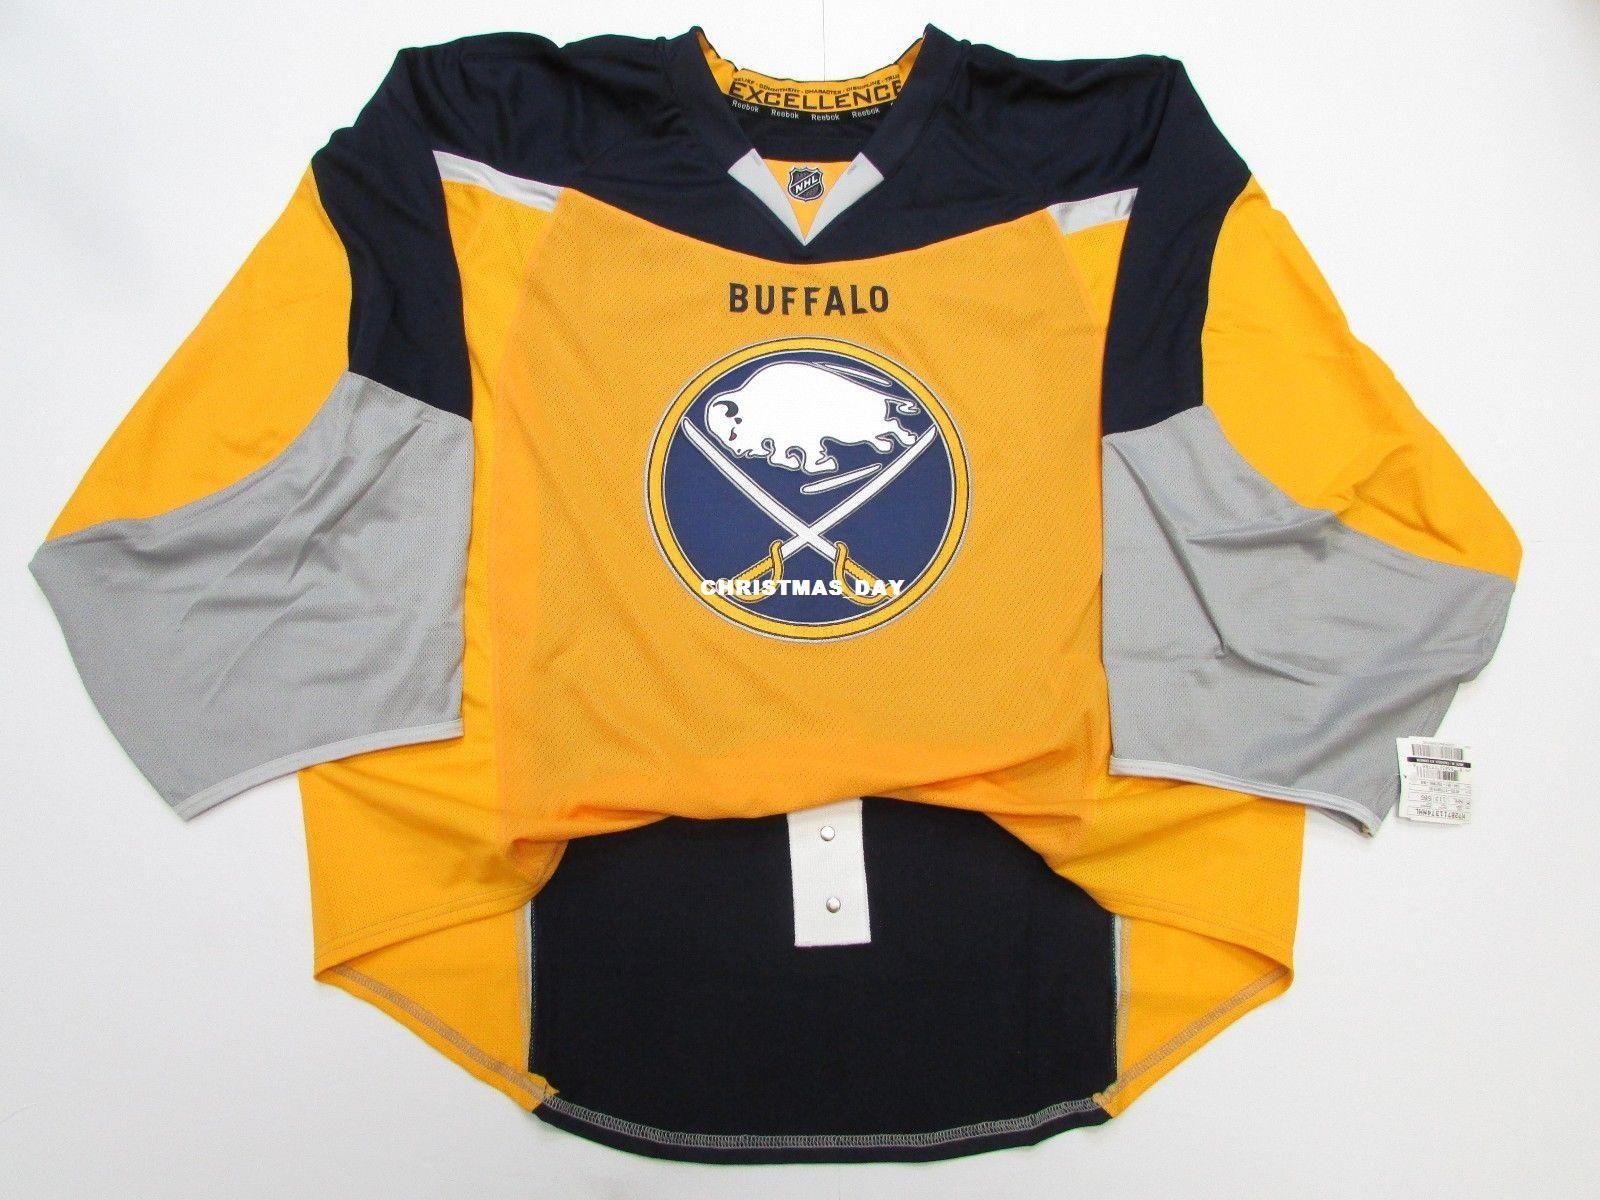 designer fashion 51808 e1281 Cheap custom BUFFALO SABRES JERSEY GOALIE CUT ISSUED EDGE 2.0 7287 Mens  Stitched Personalized hockey Jerseys